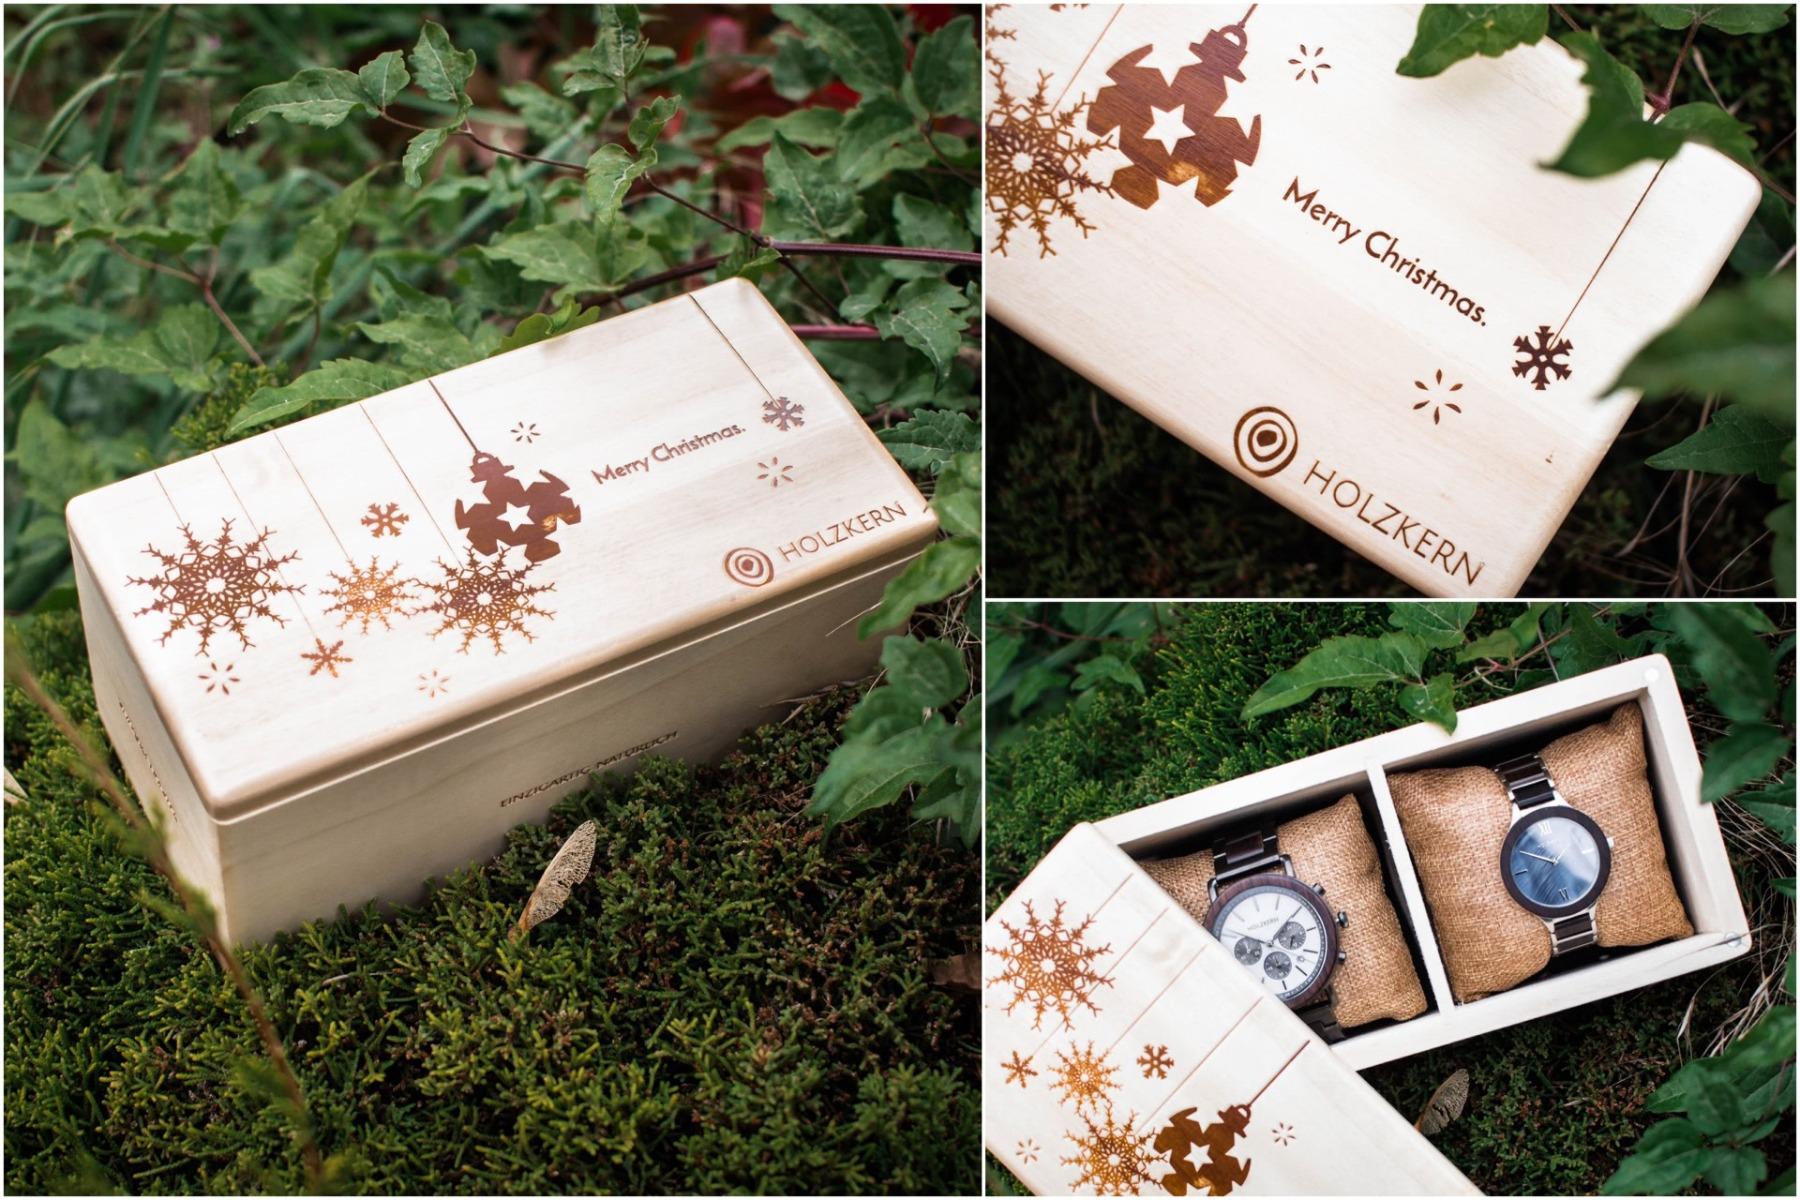 The Holzkern Christmas-Box